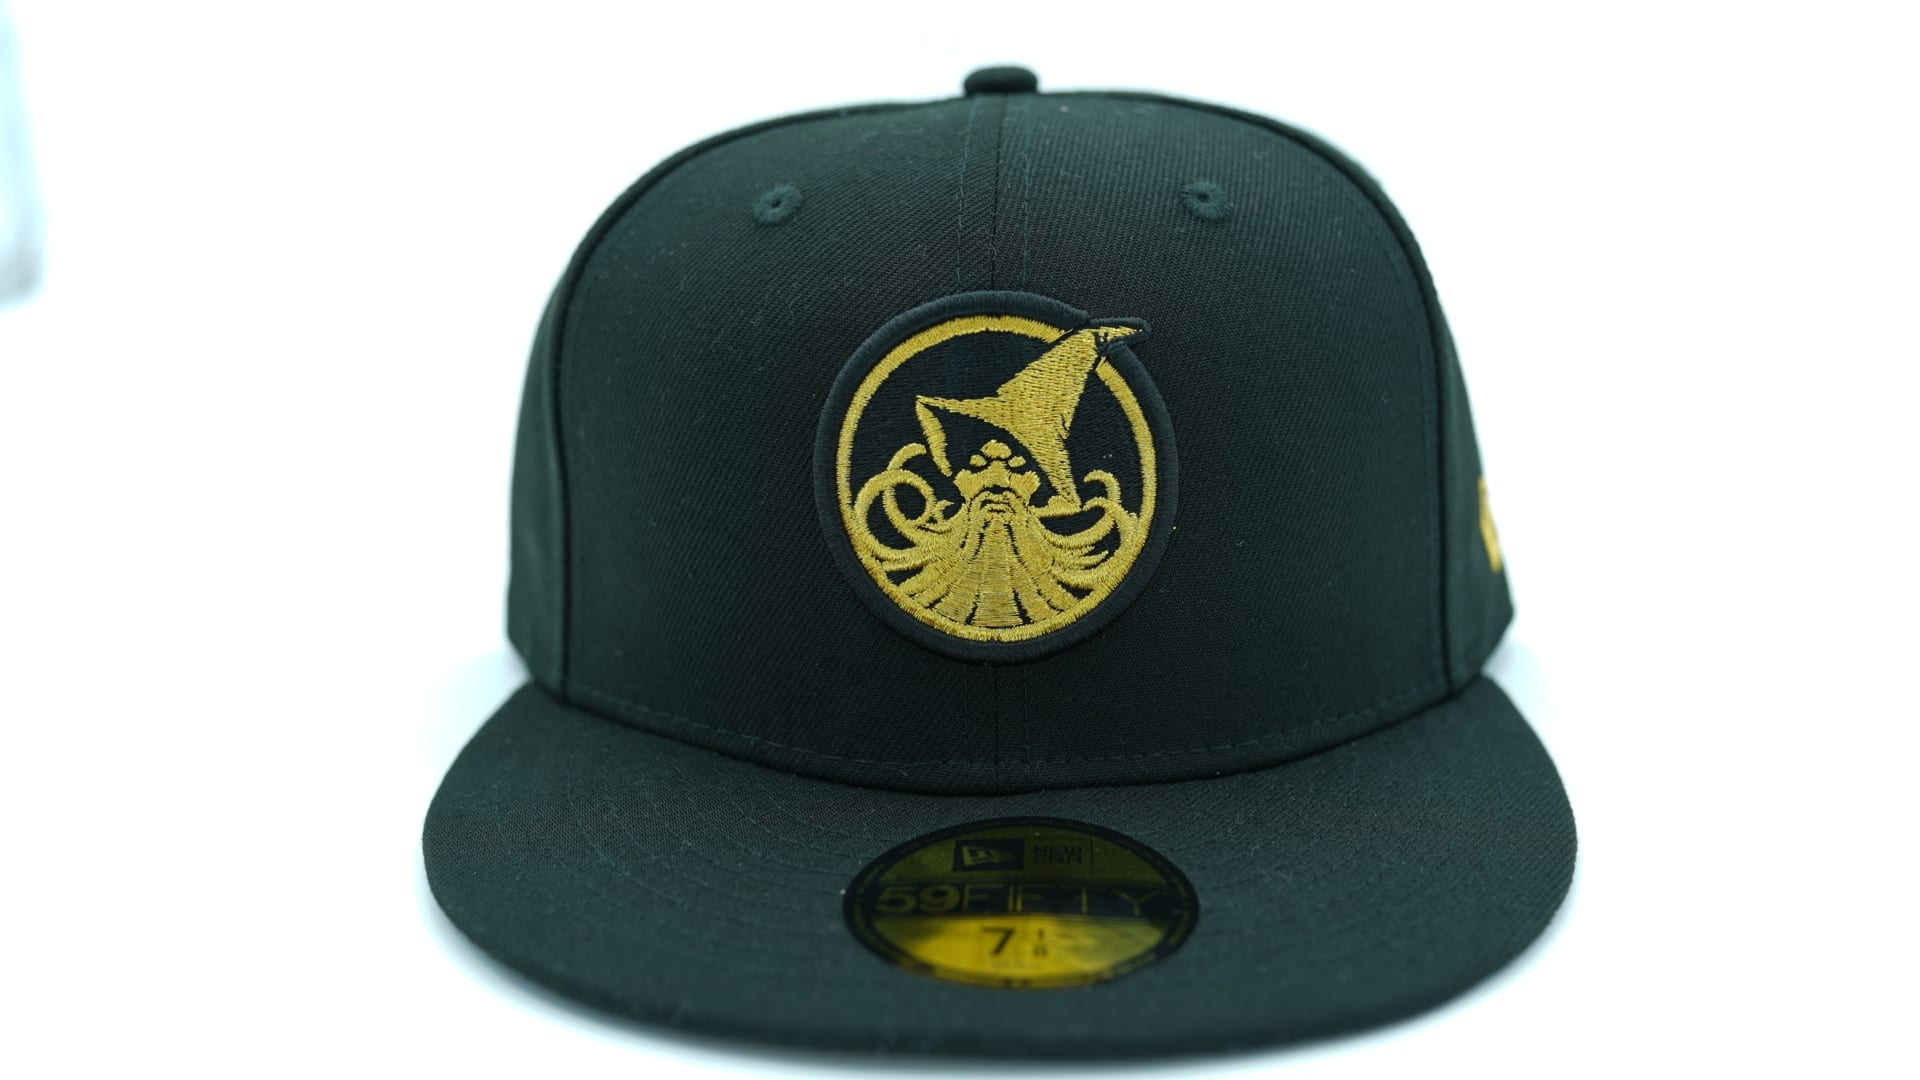 e26bccda0c8 los angeles dodgers denim levis 59fifty fitted baseball cap new era levis  mlb